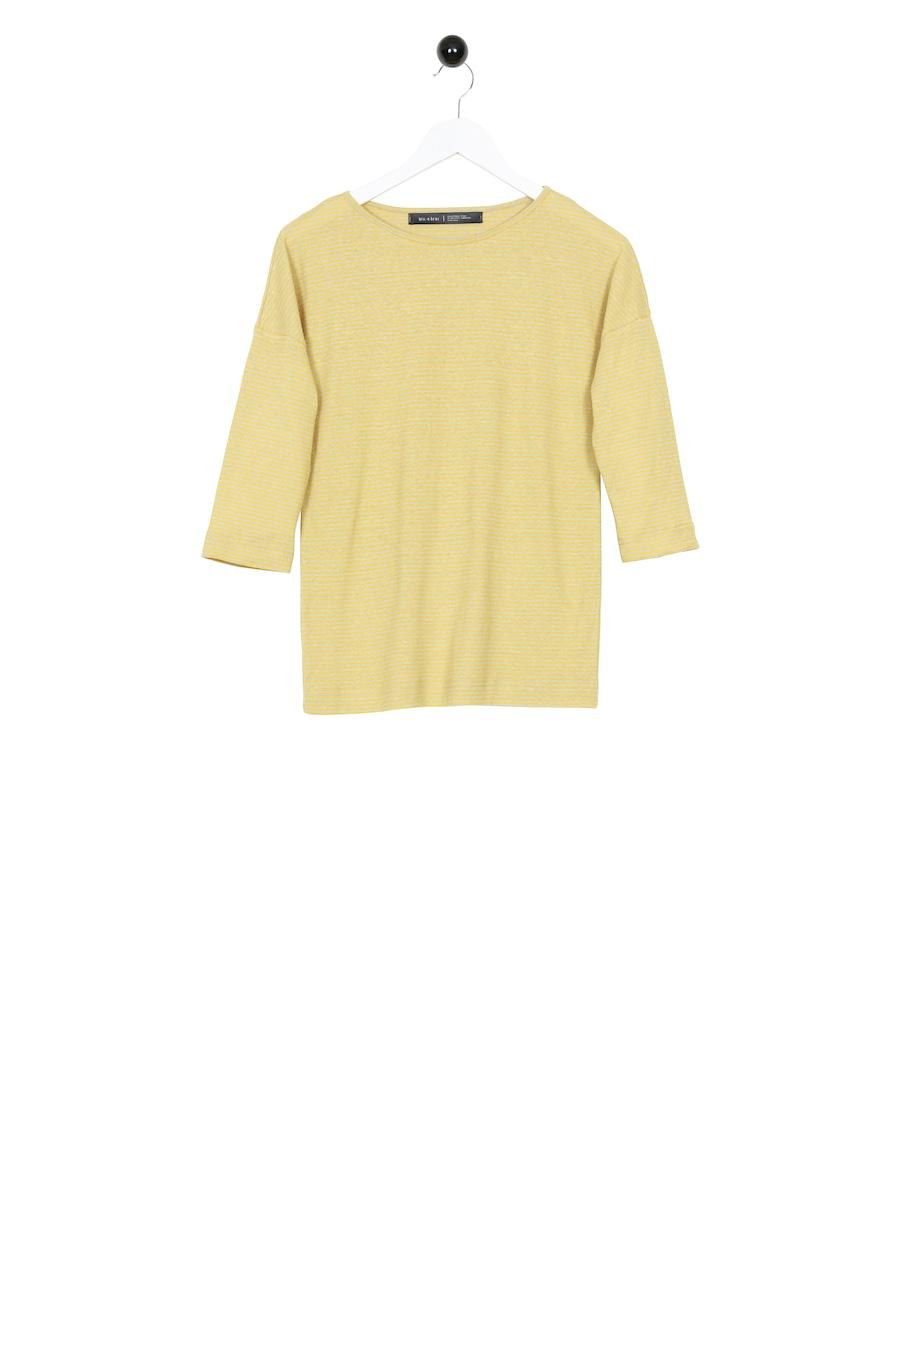 Grus Sweater